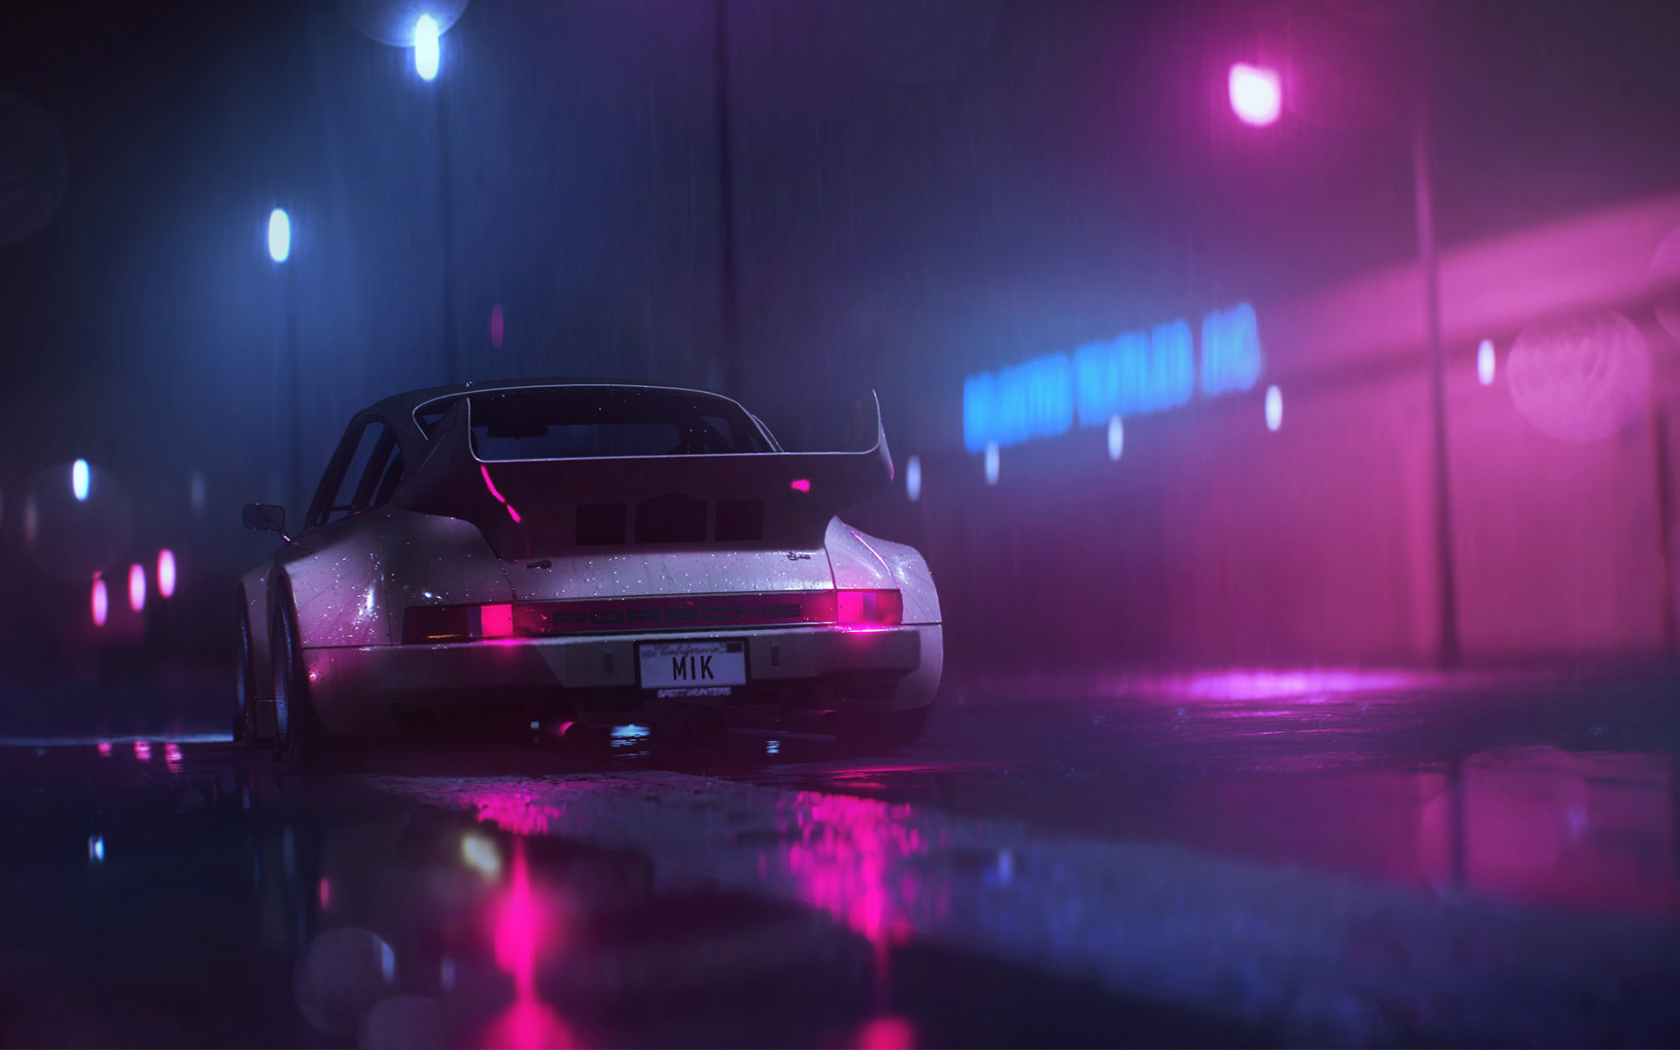 Download wallpaper in (800x600) download (800x600) wallpaper. Desktop Wallpaper Porsche Car Sports Car Rain Night Art Hd Image Picture Background 92661d